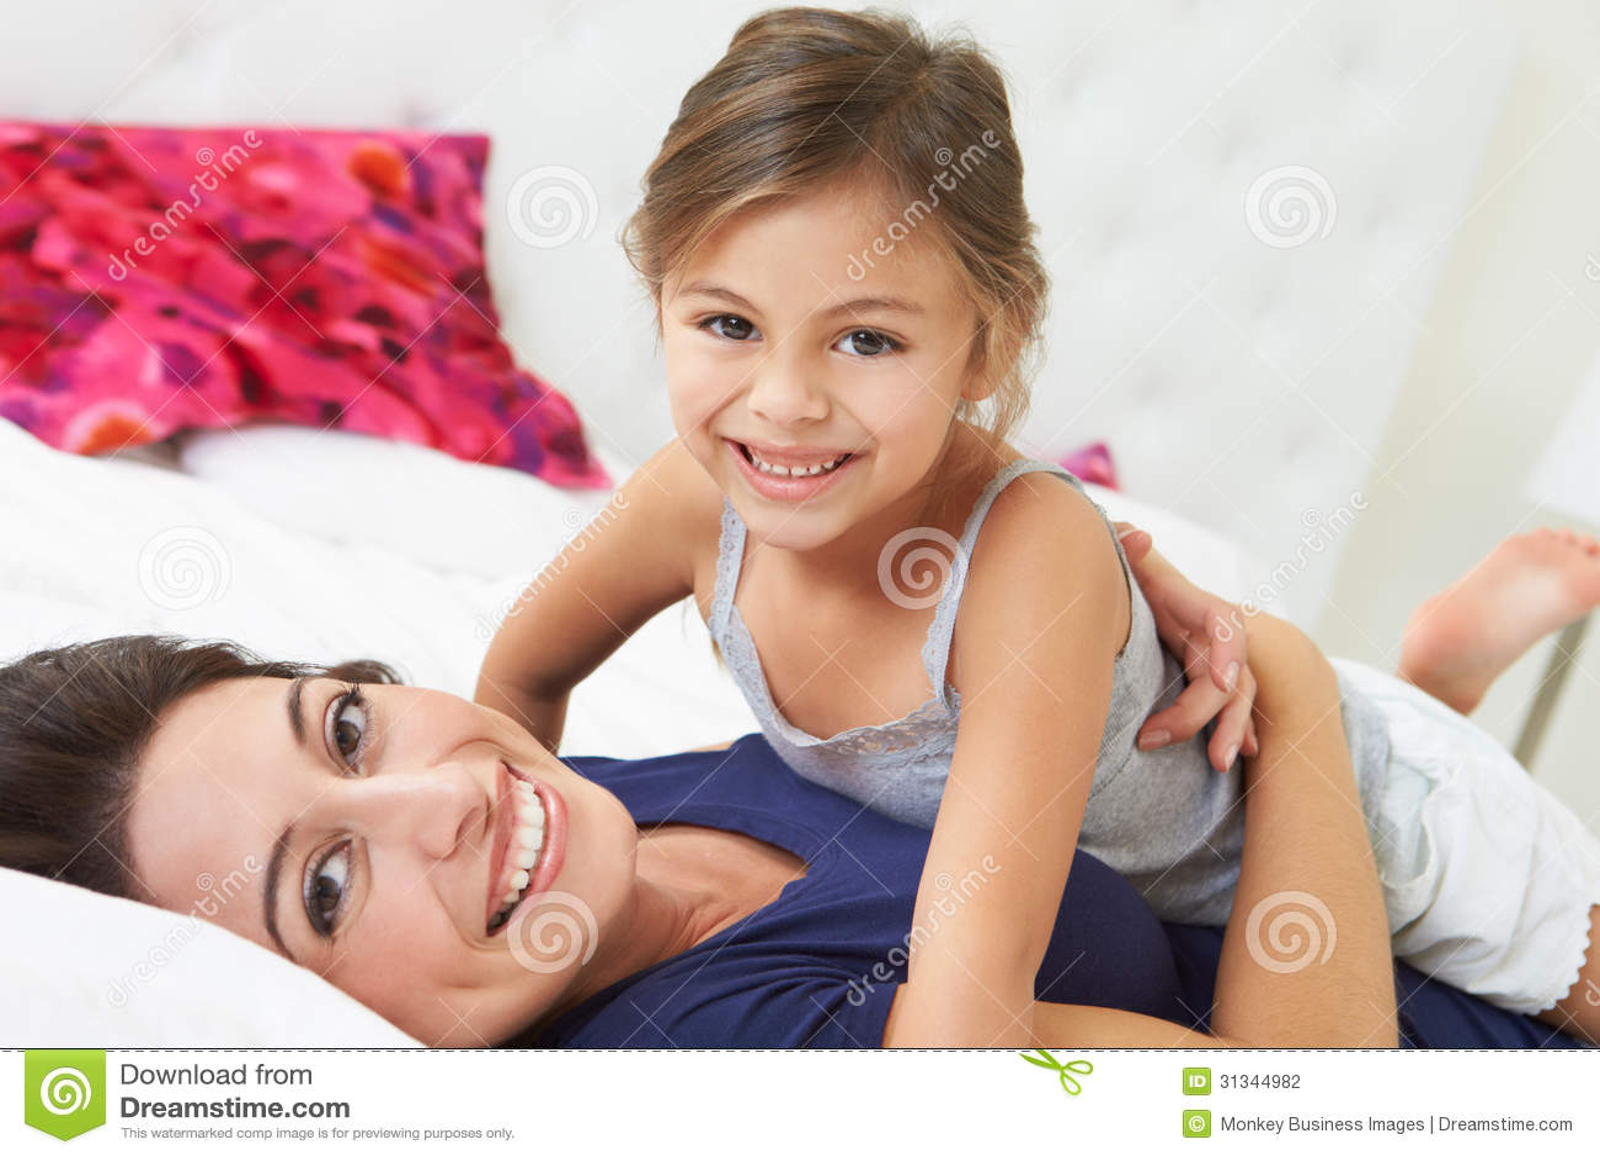 Мама и дочь » Порно инцест онлайн, инцест видео ролики